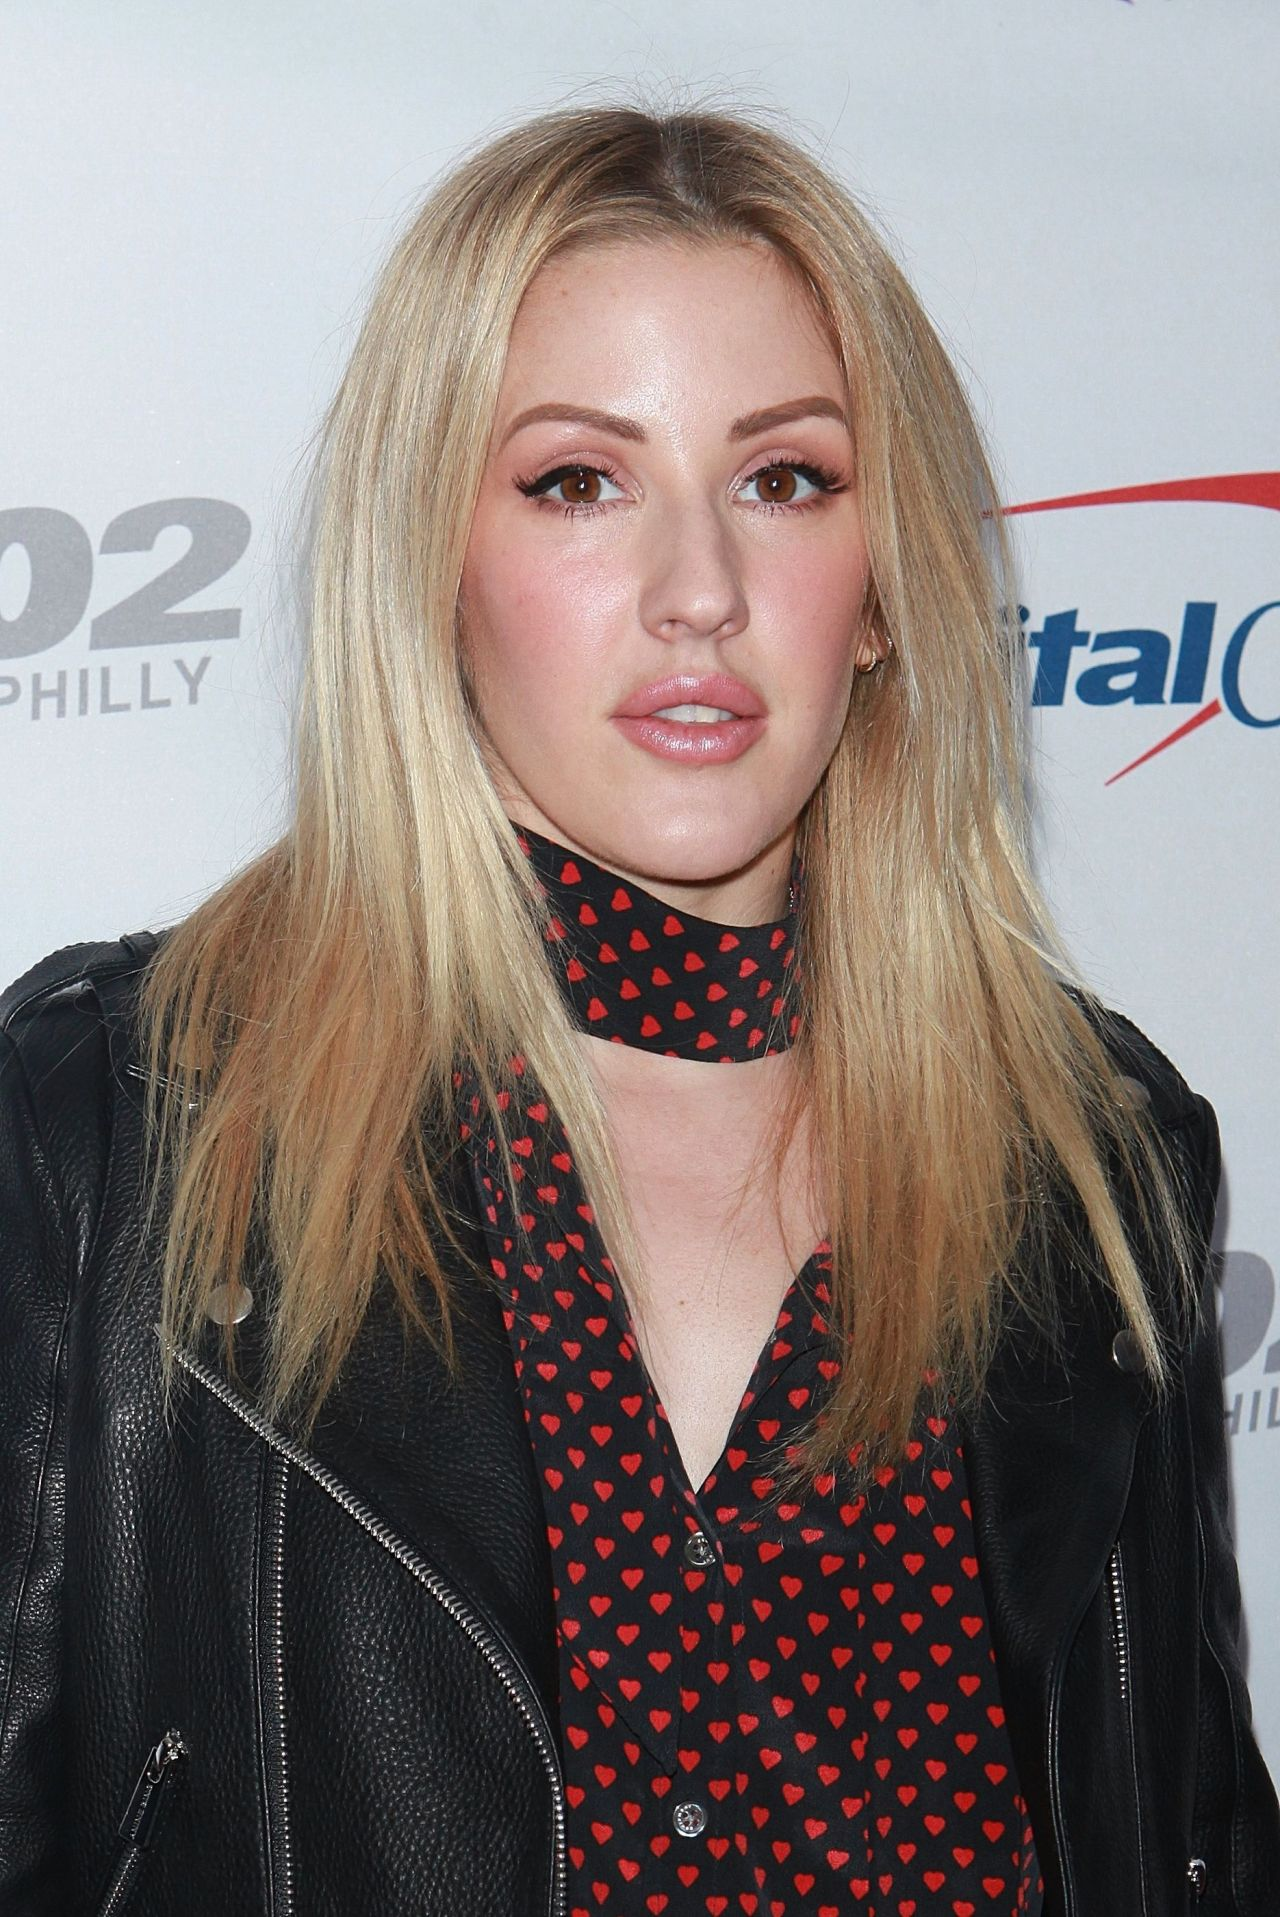 Ellie Goulding - Q102's iHeartRadio Jingle Ball in ...